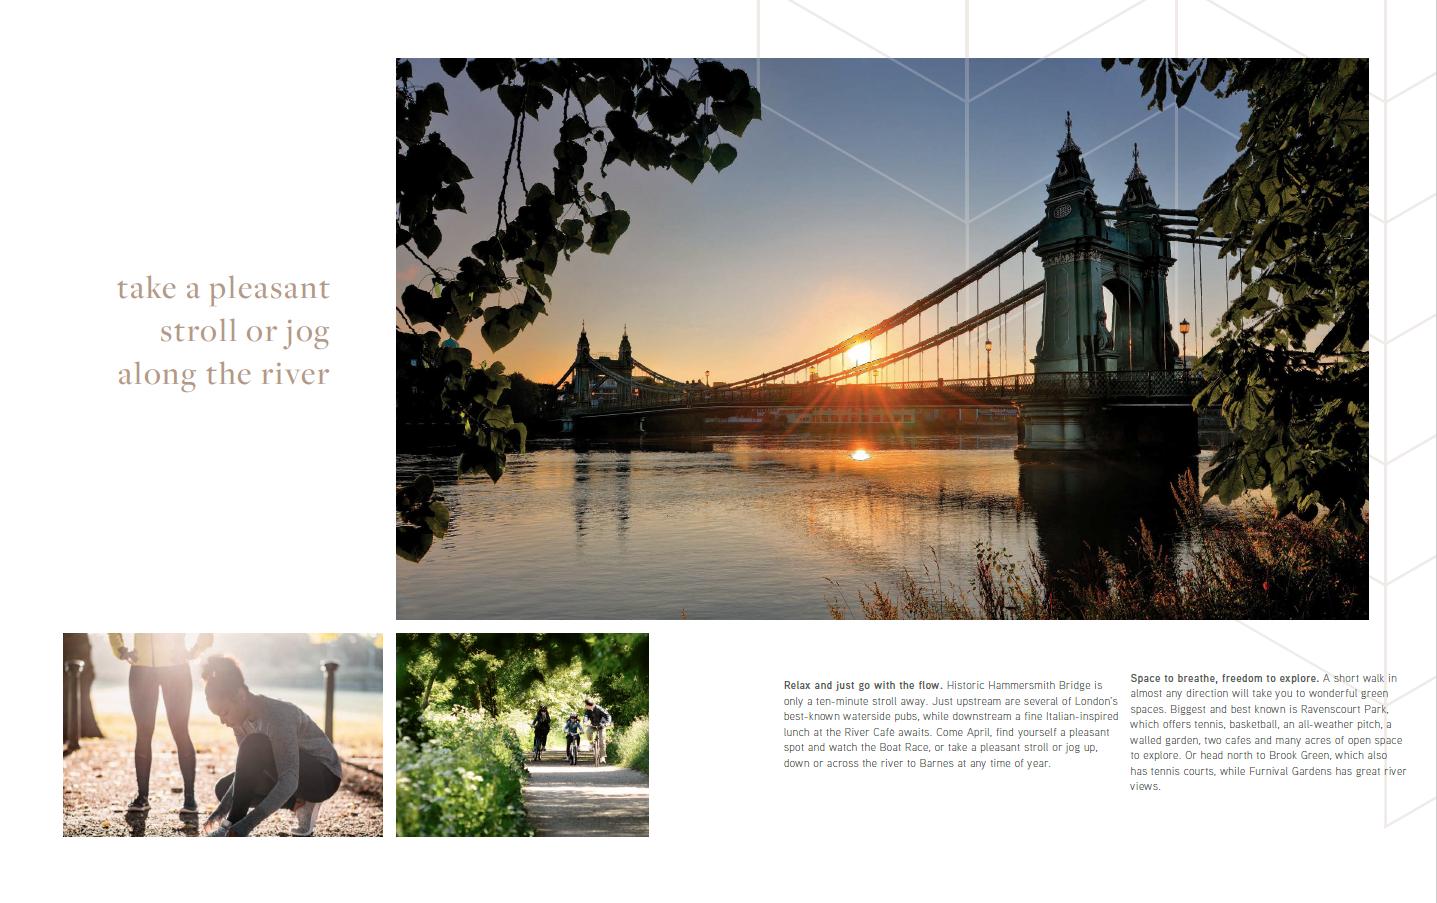 Sovereign Court, Hammersmith property brochure